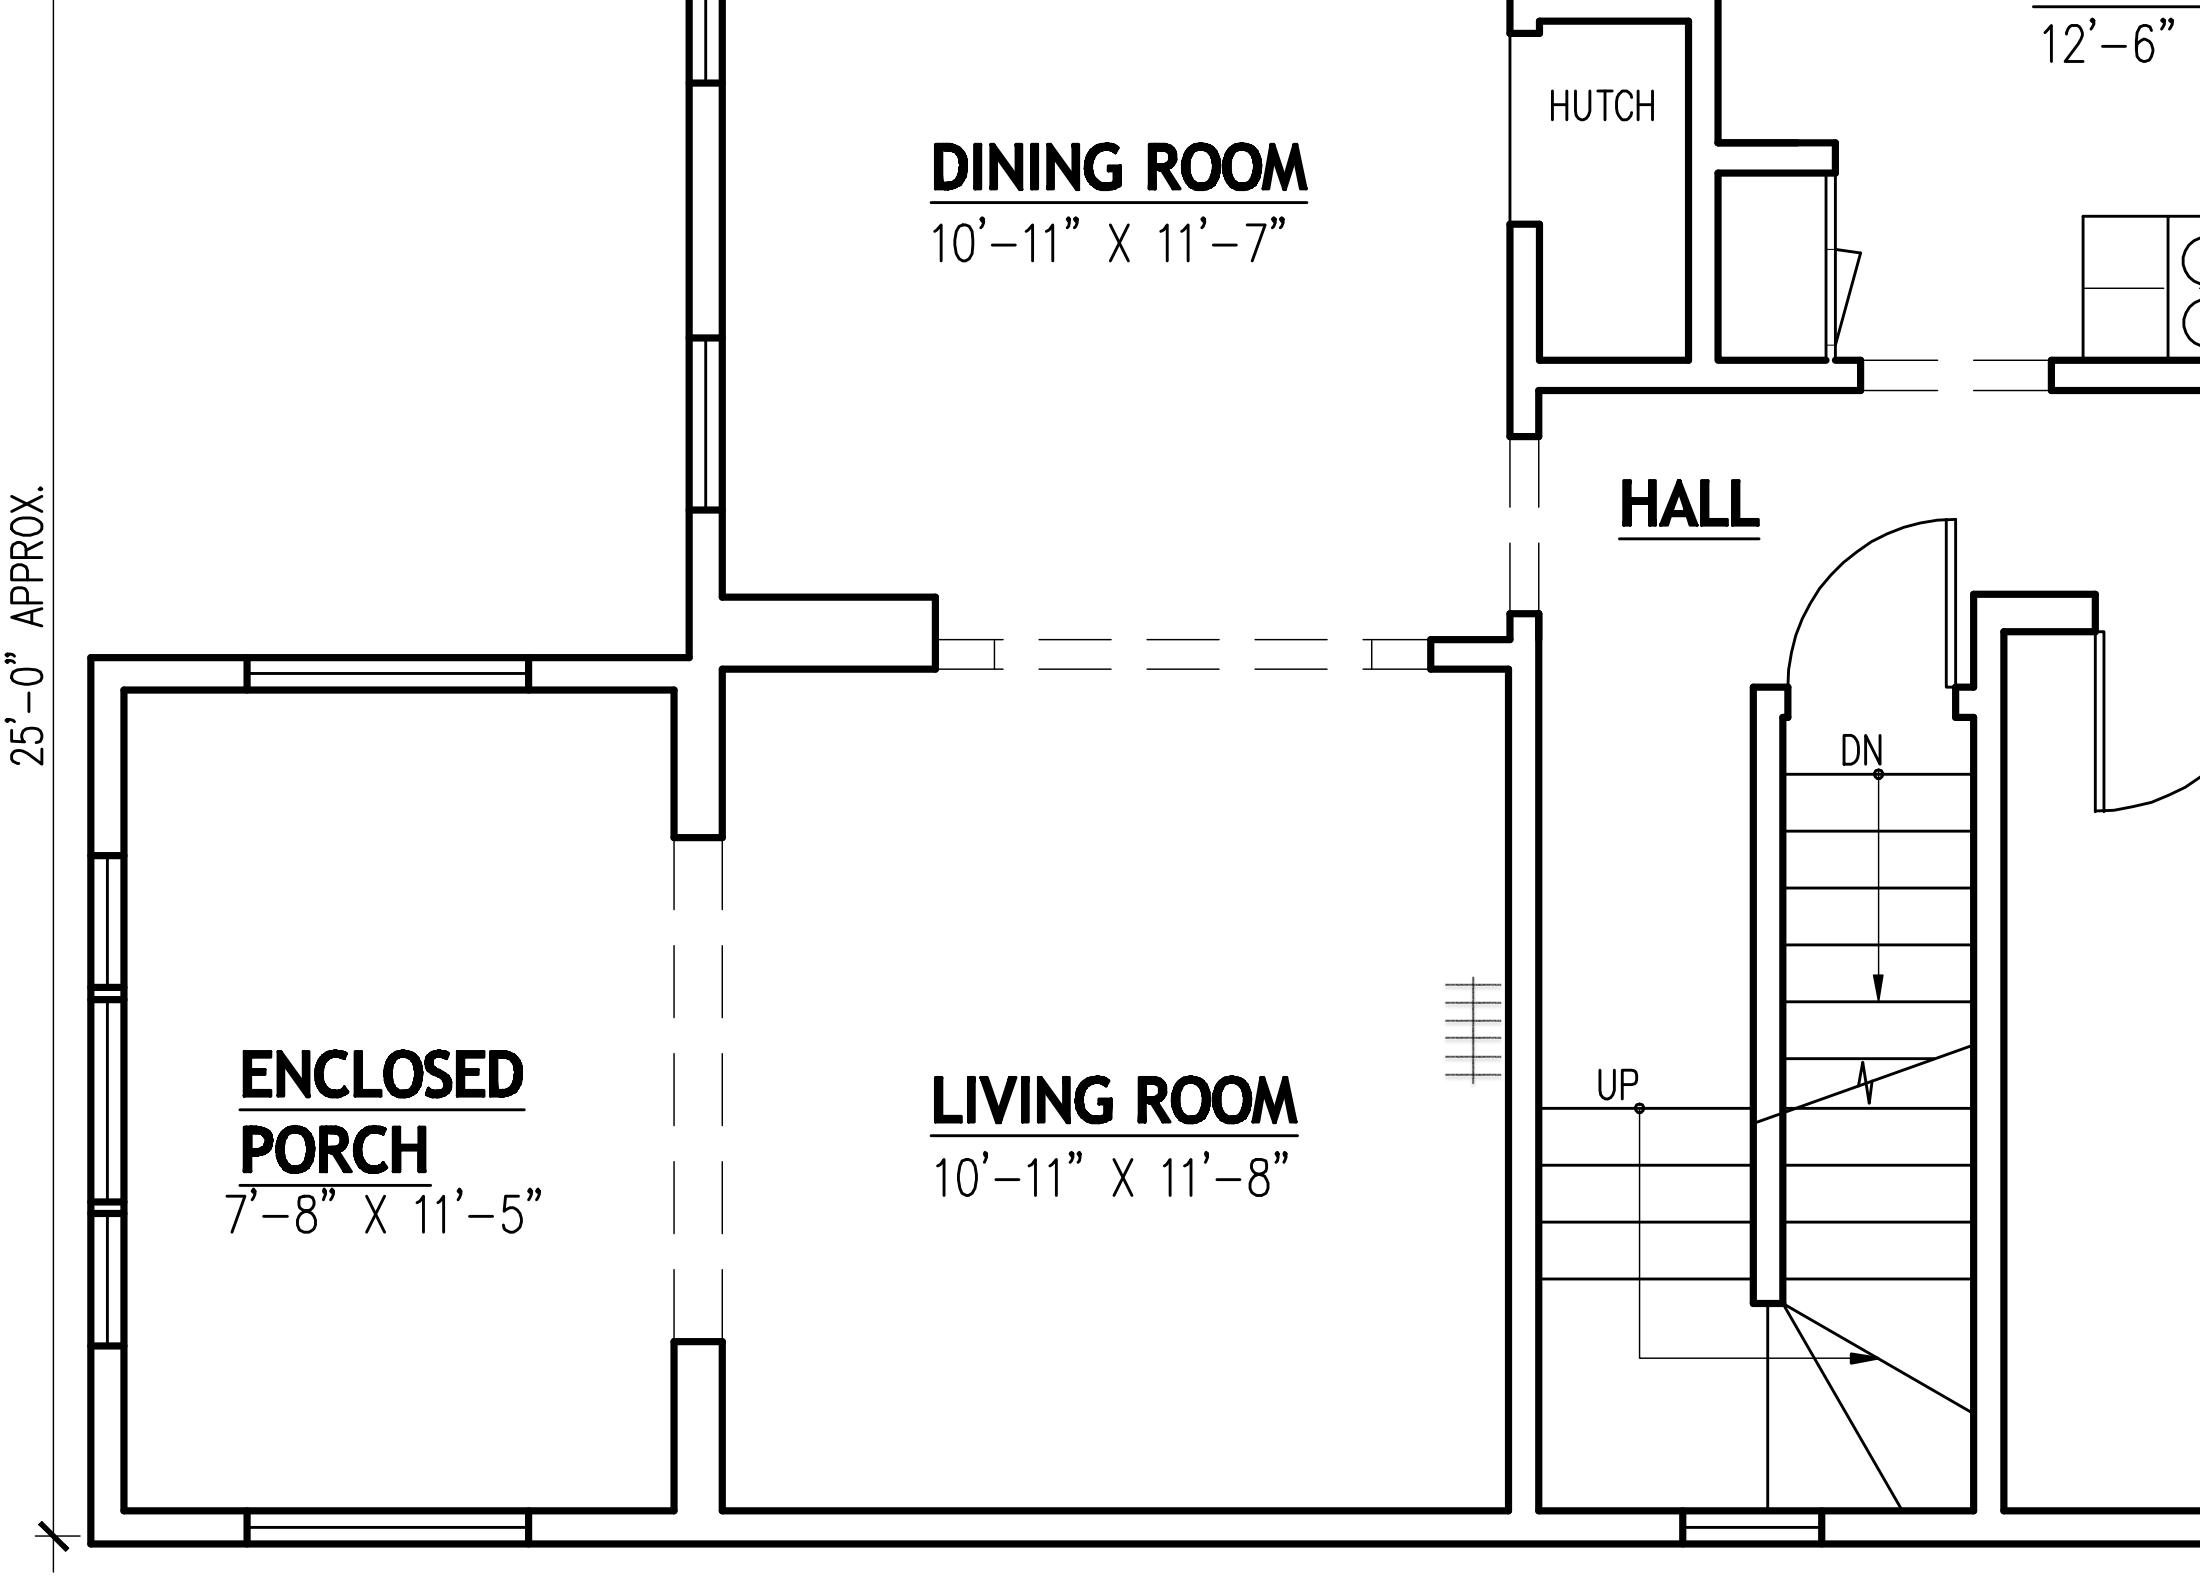 living-room-floor-plan-big Kaufman House Floor Plan on side breeze floor plans, palm springs house plans, the chadwick floor plans, kaufman house diagrams,